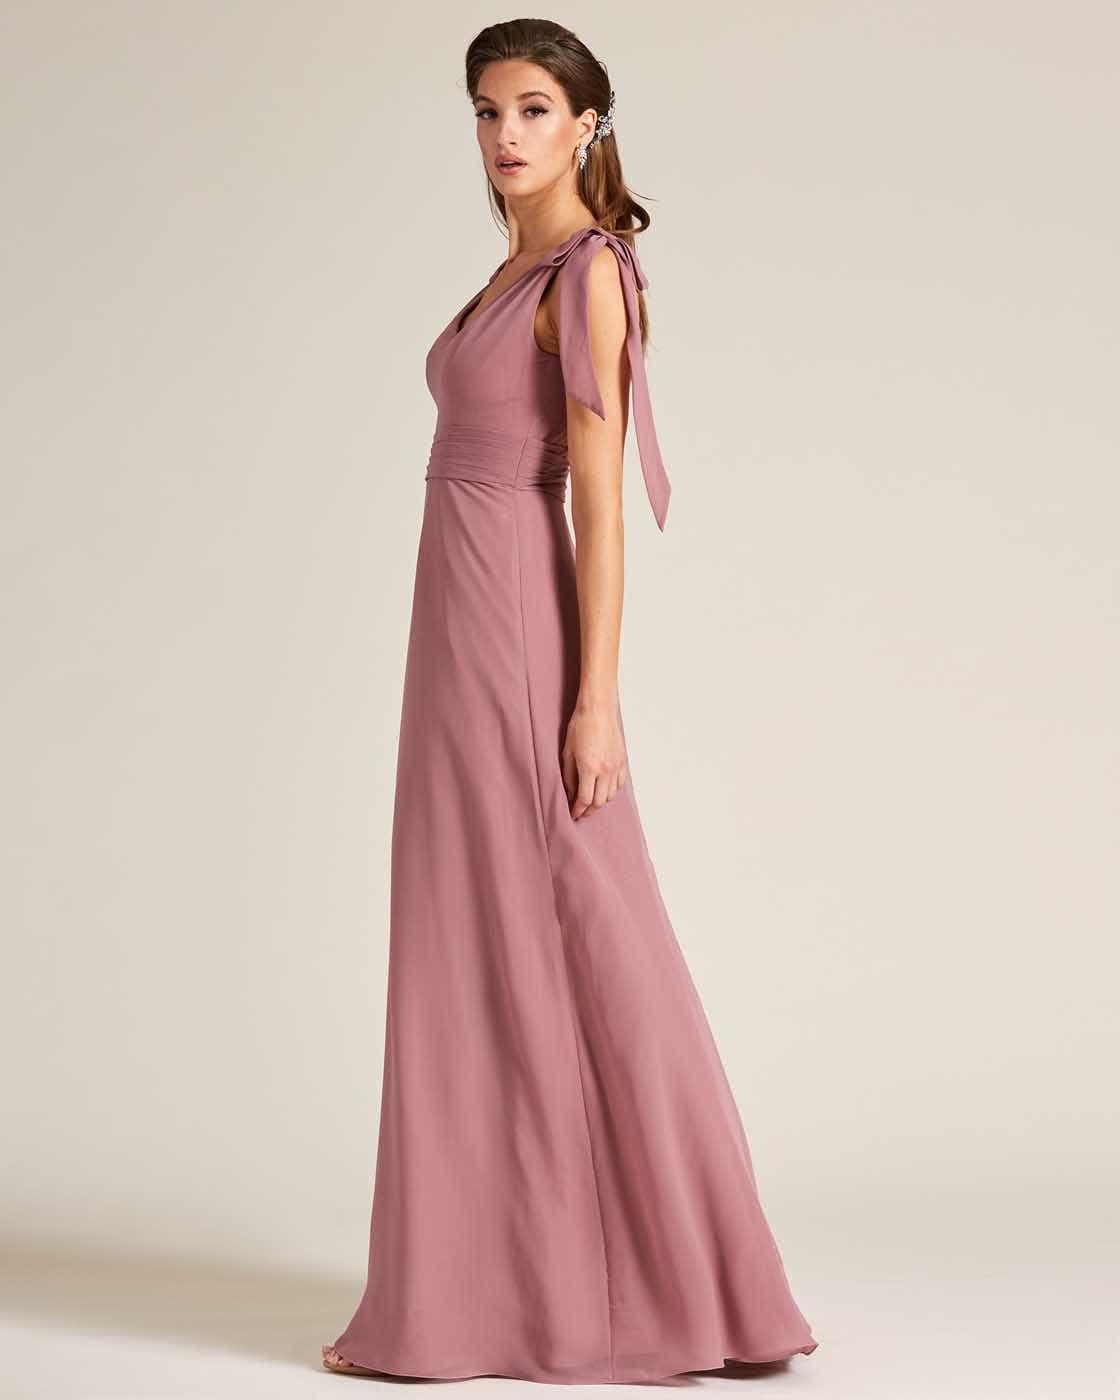 Rose Pink Bow Sleeve Long Skirt Dress - Side